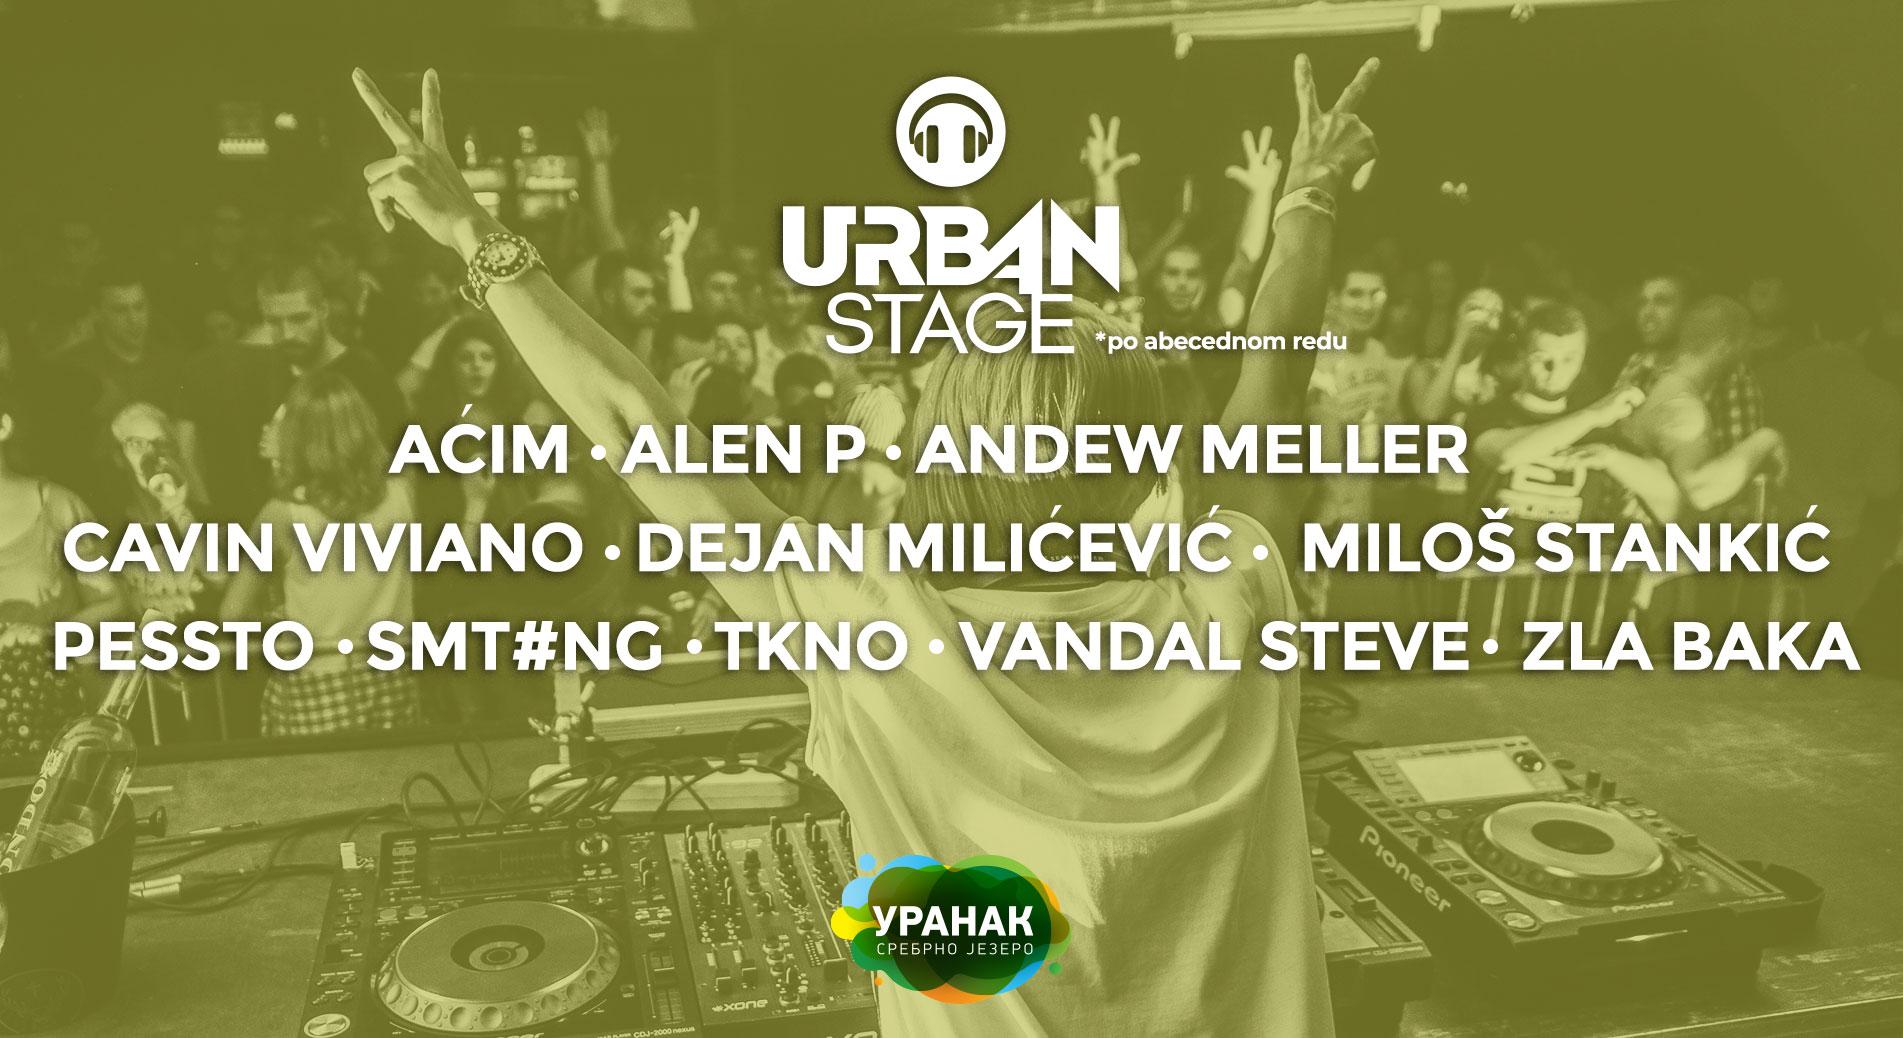 Urban Stage 29.04 – 01.05.2018. Uranak Festival